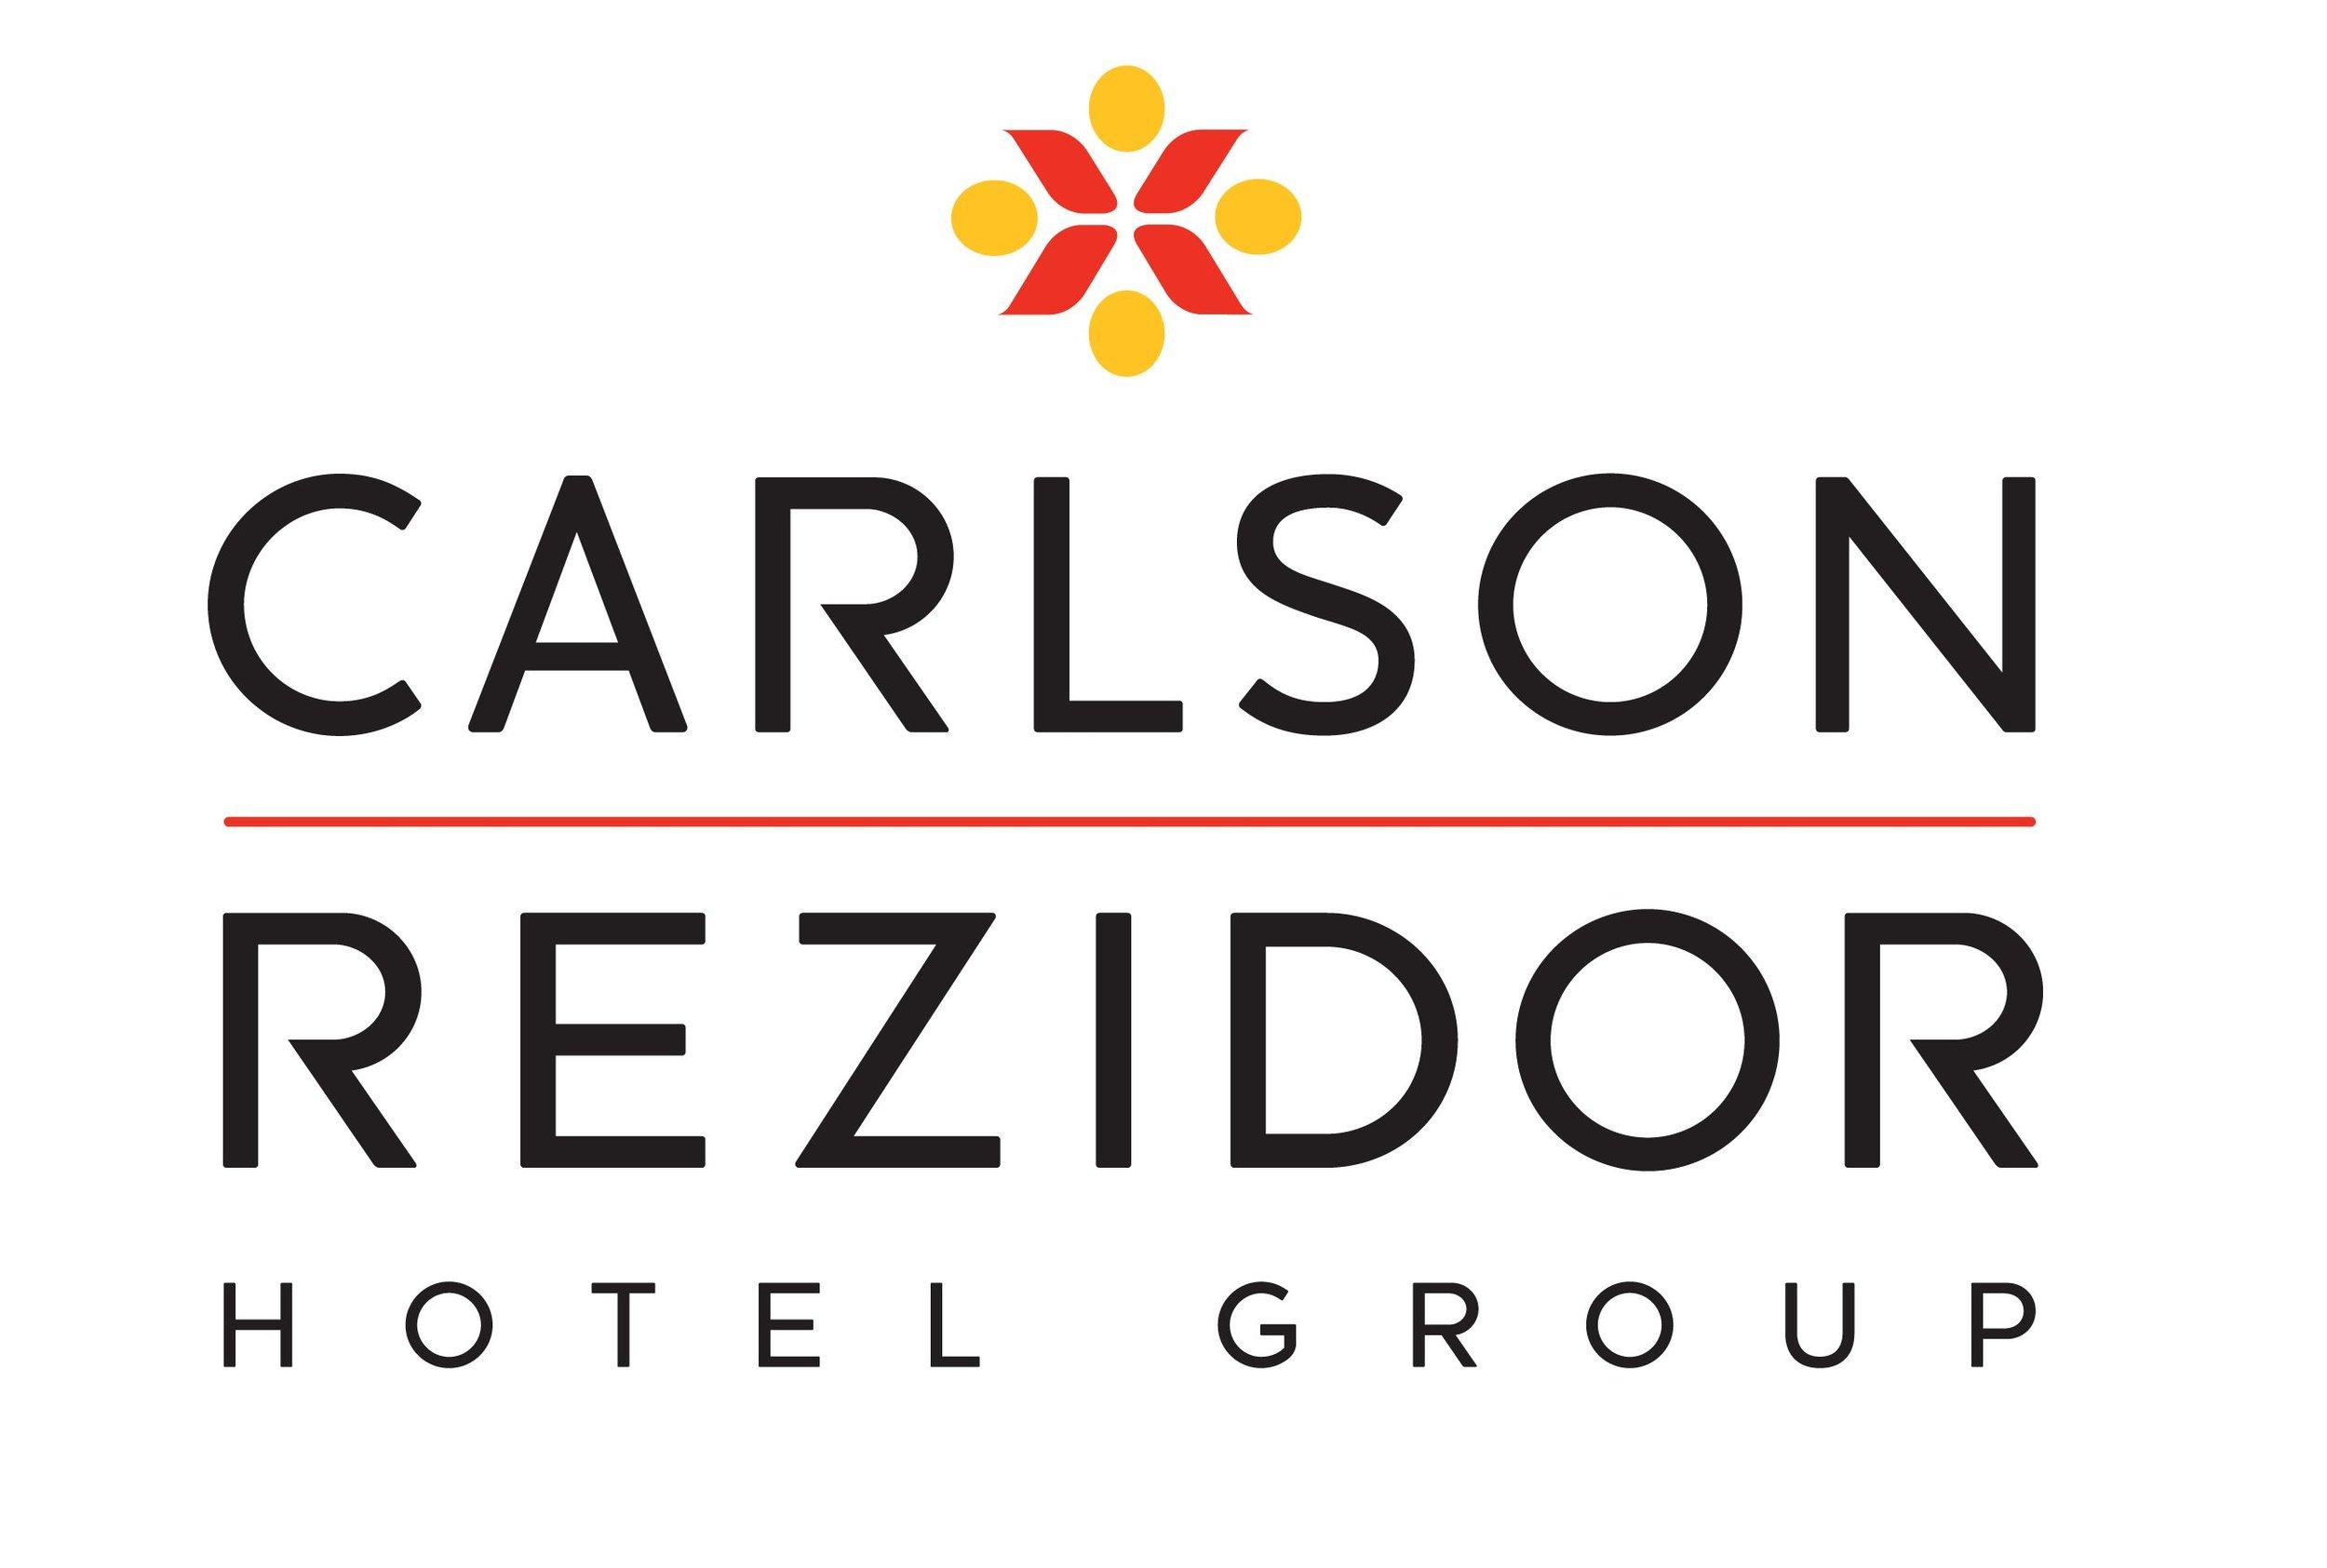 Carlson_rezidor_hotel_group_logo.jpg